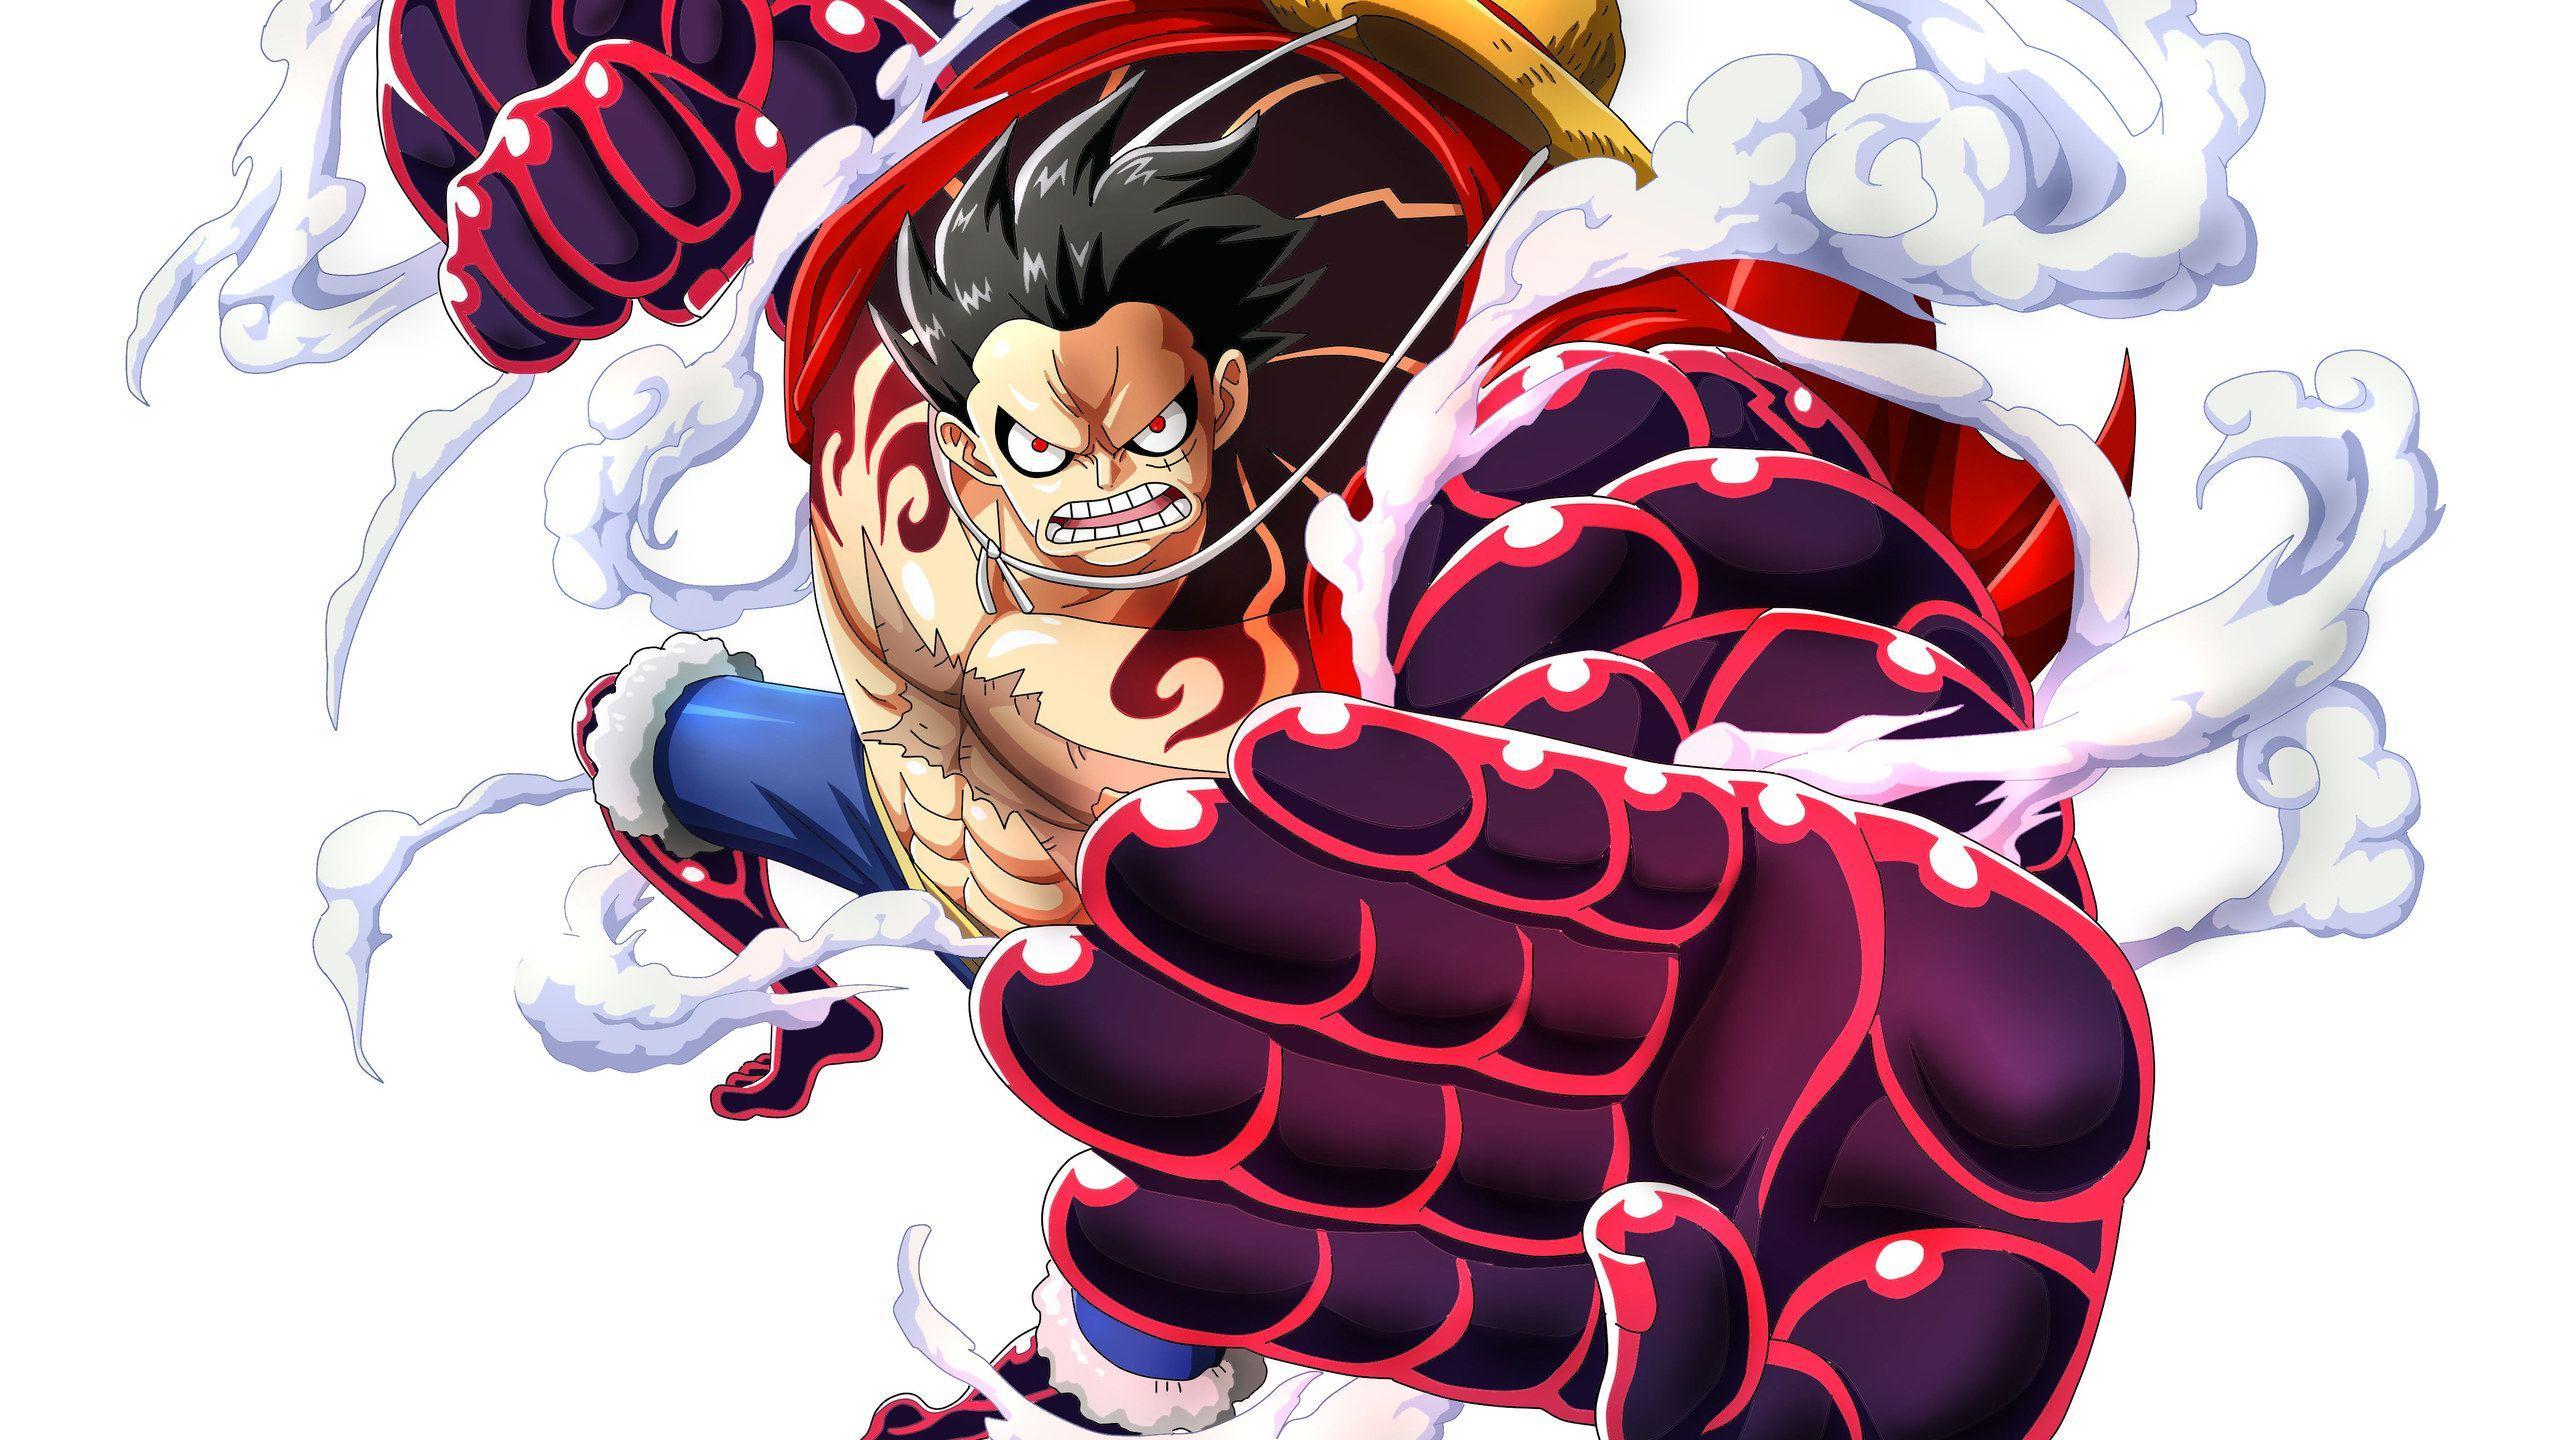 Portrait One Piece Wallpapers Top Free Portrait One Piece